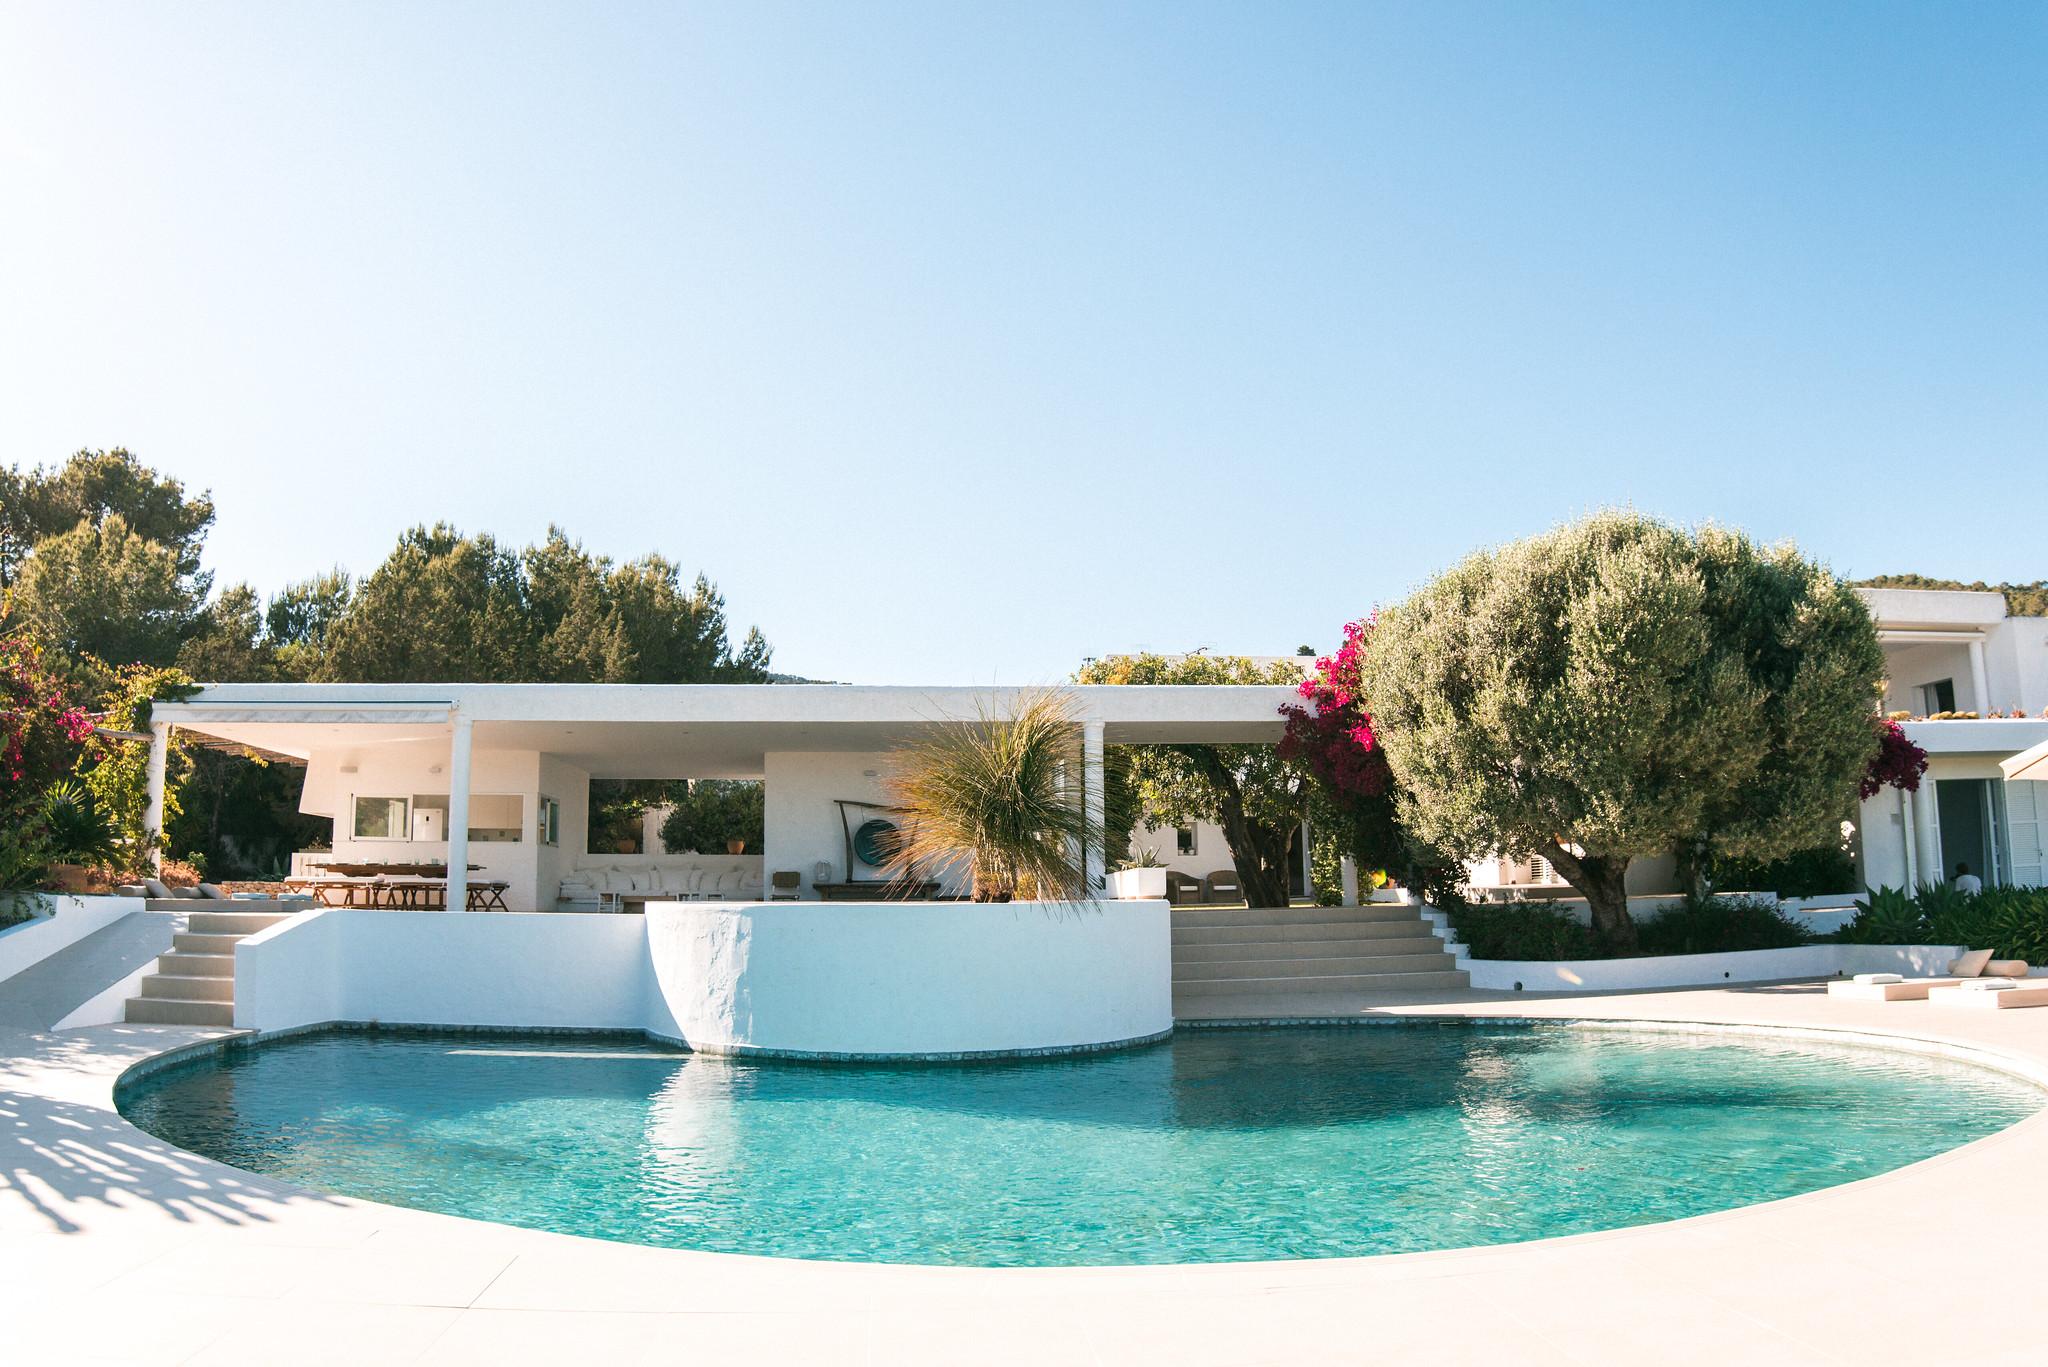 https://www.white-ibiza.com/wp-content/uploads/2020/06/white-ibiza-villas-casa-odette-exterior.jpg